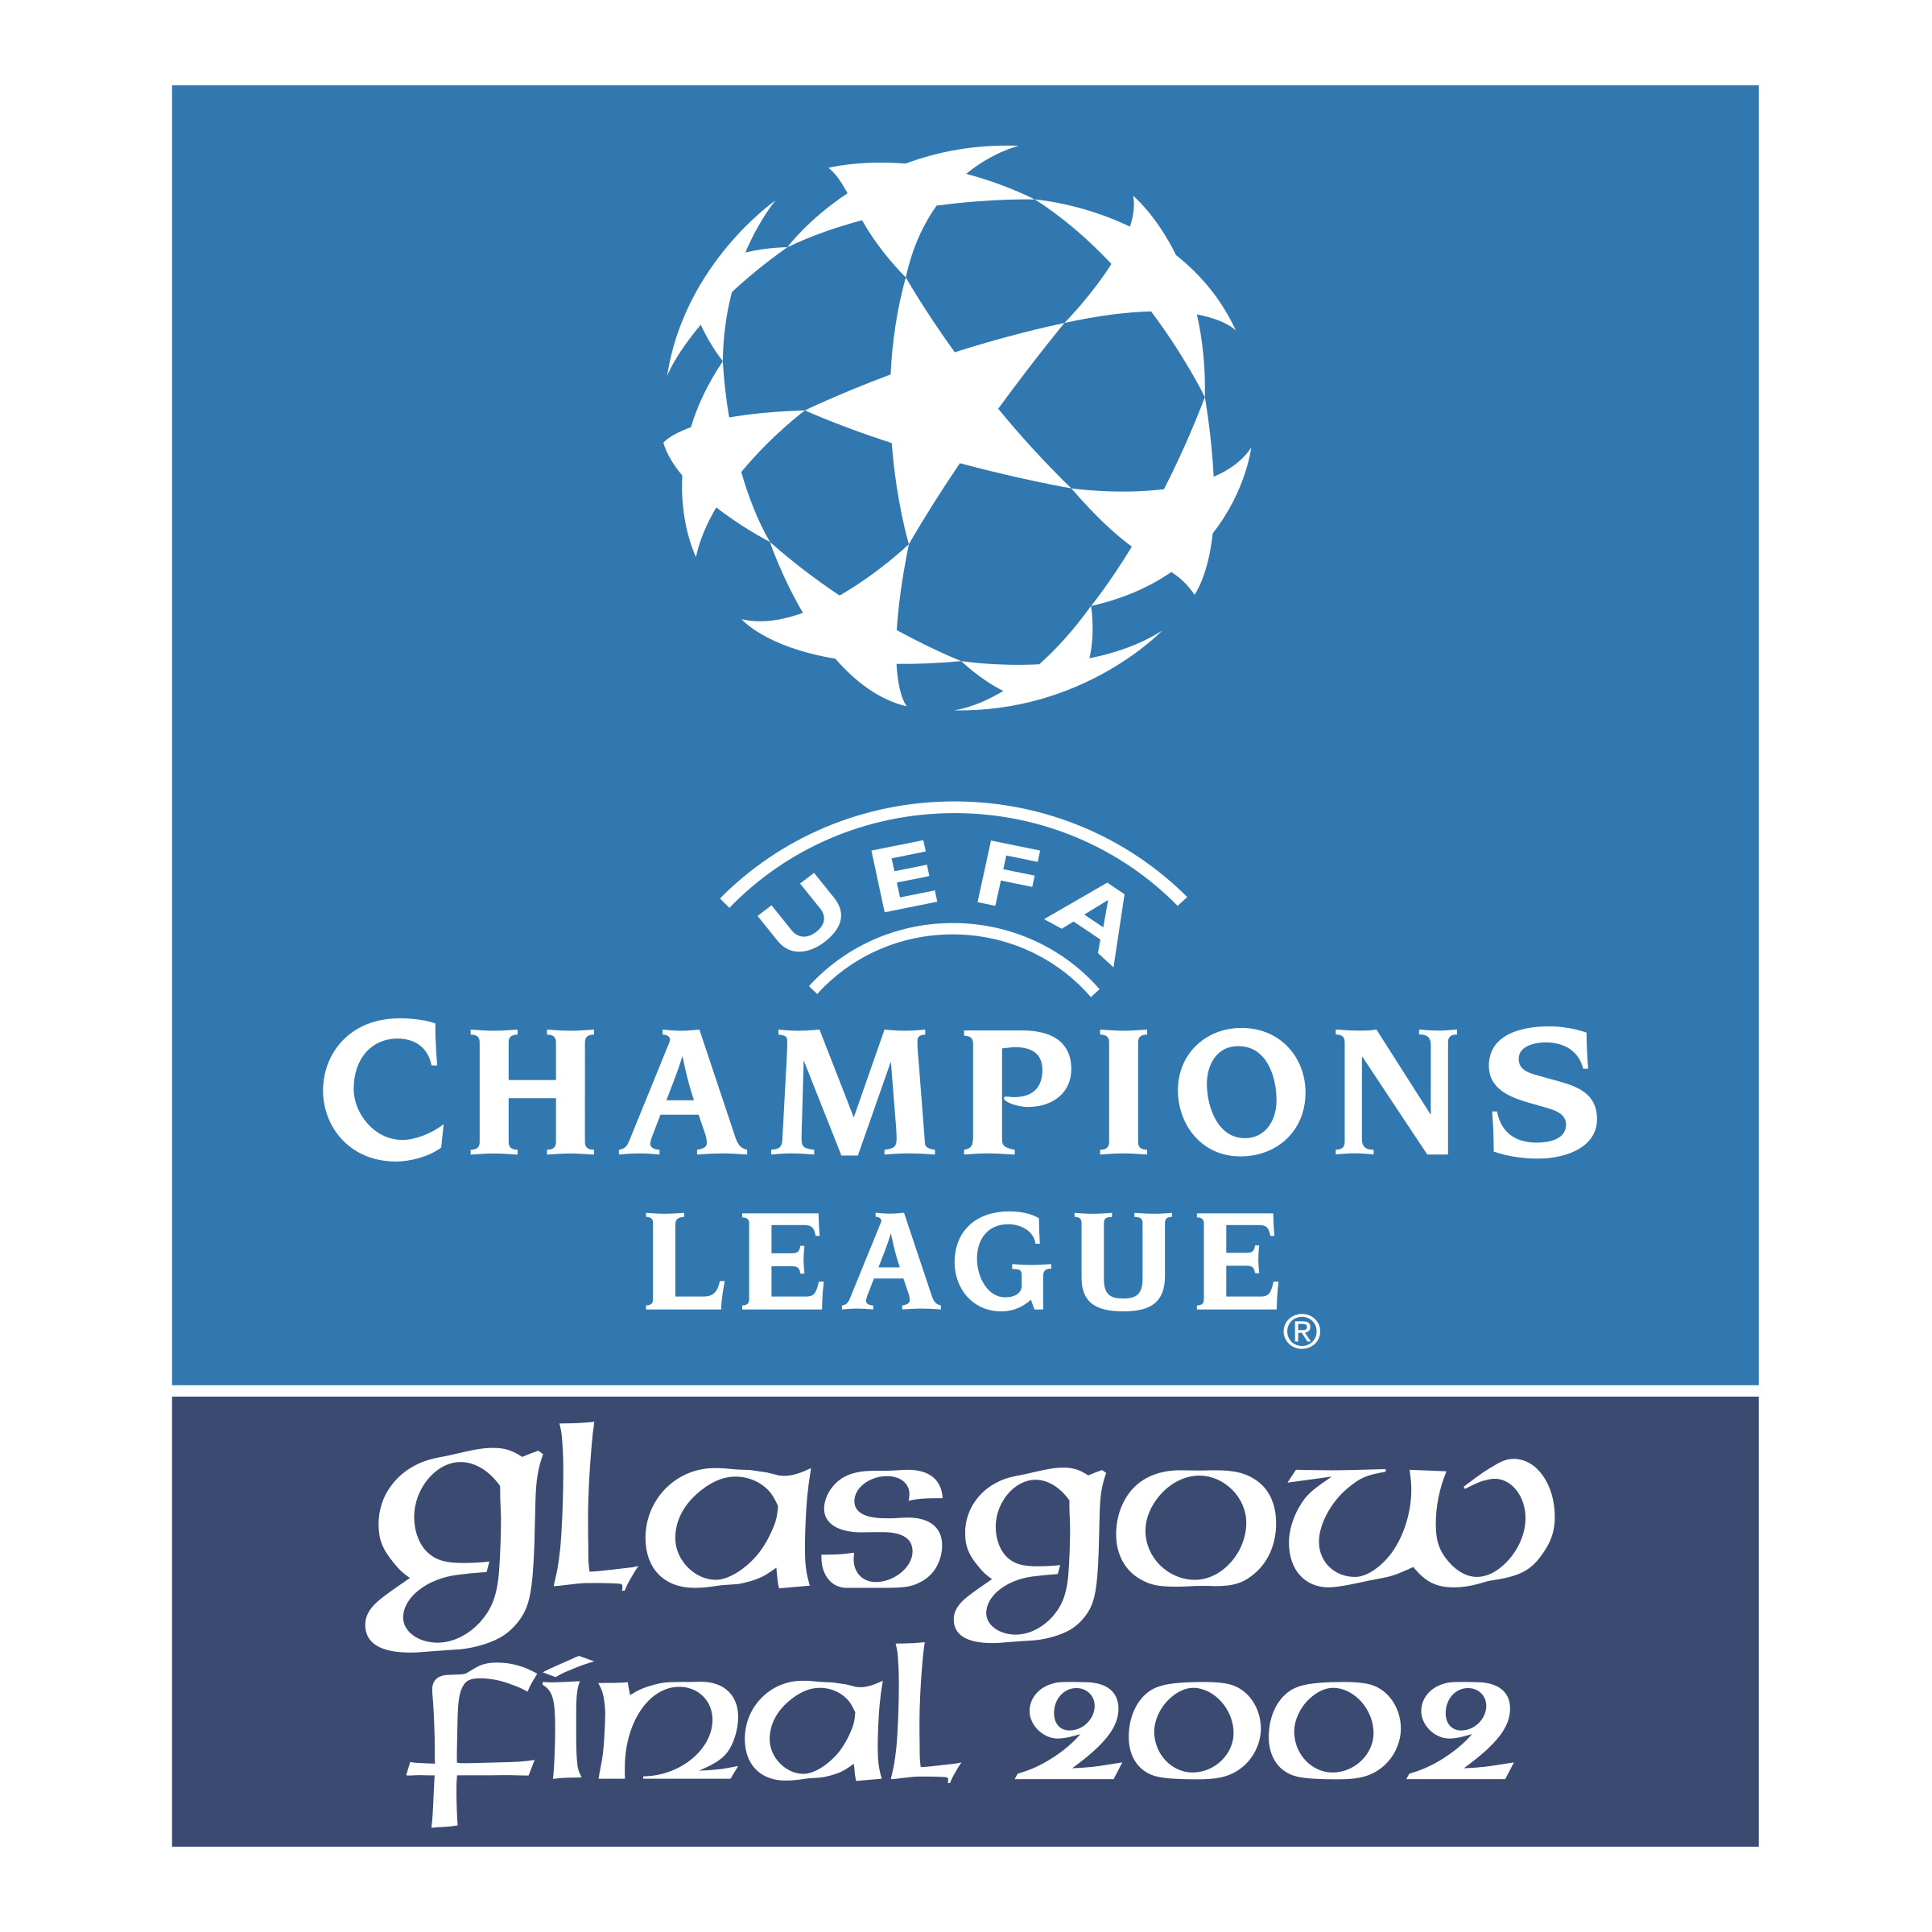 uefa champions league glasgow final 2002 logo png transparent svg vector freebie supply uefa champions league glasgow final